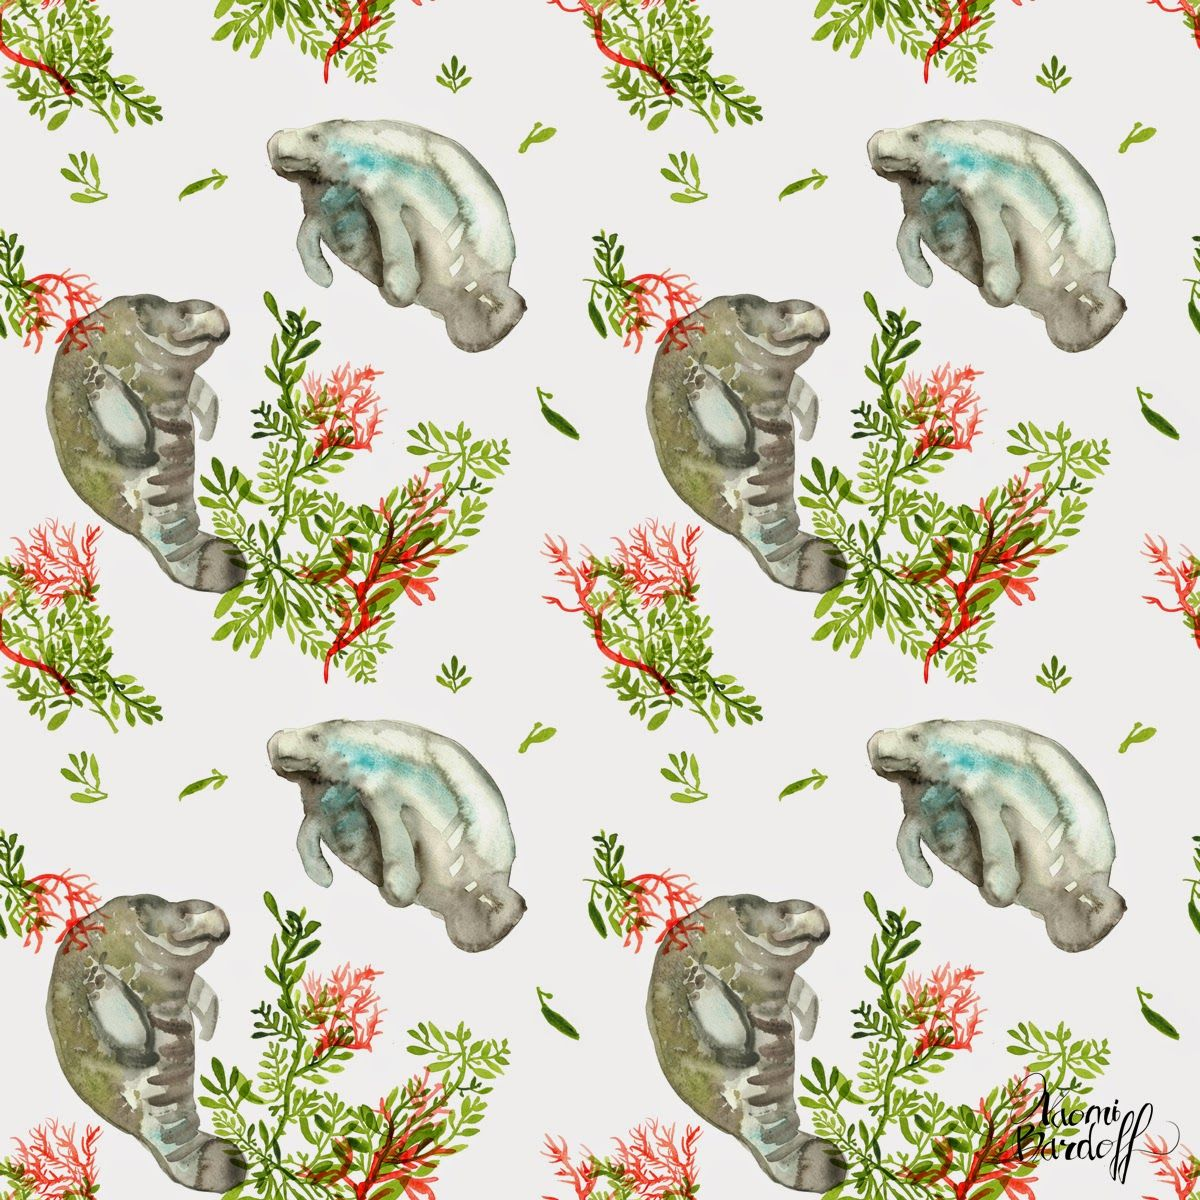 Naomese Naomi Bardoff S Art Blog Manatee Seaweed And Coral Print Tiled Desktop Background Free Download Art Blog Manatee Art Manatee Pictures